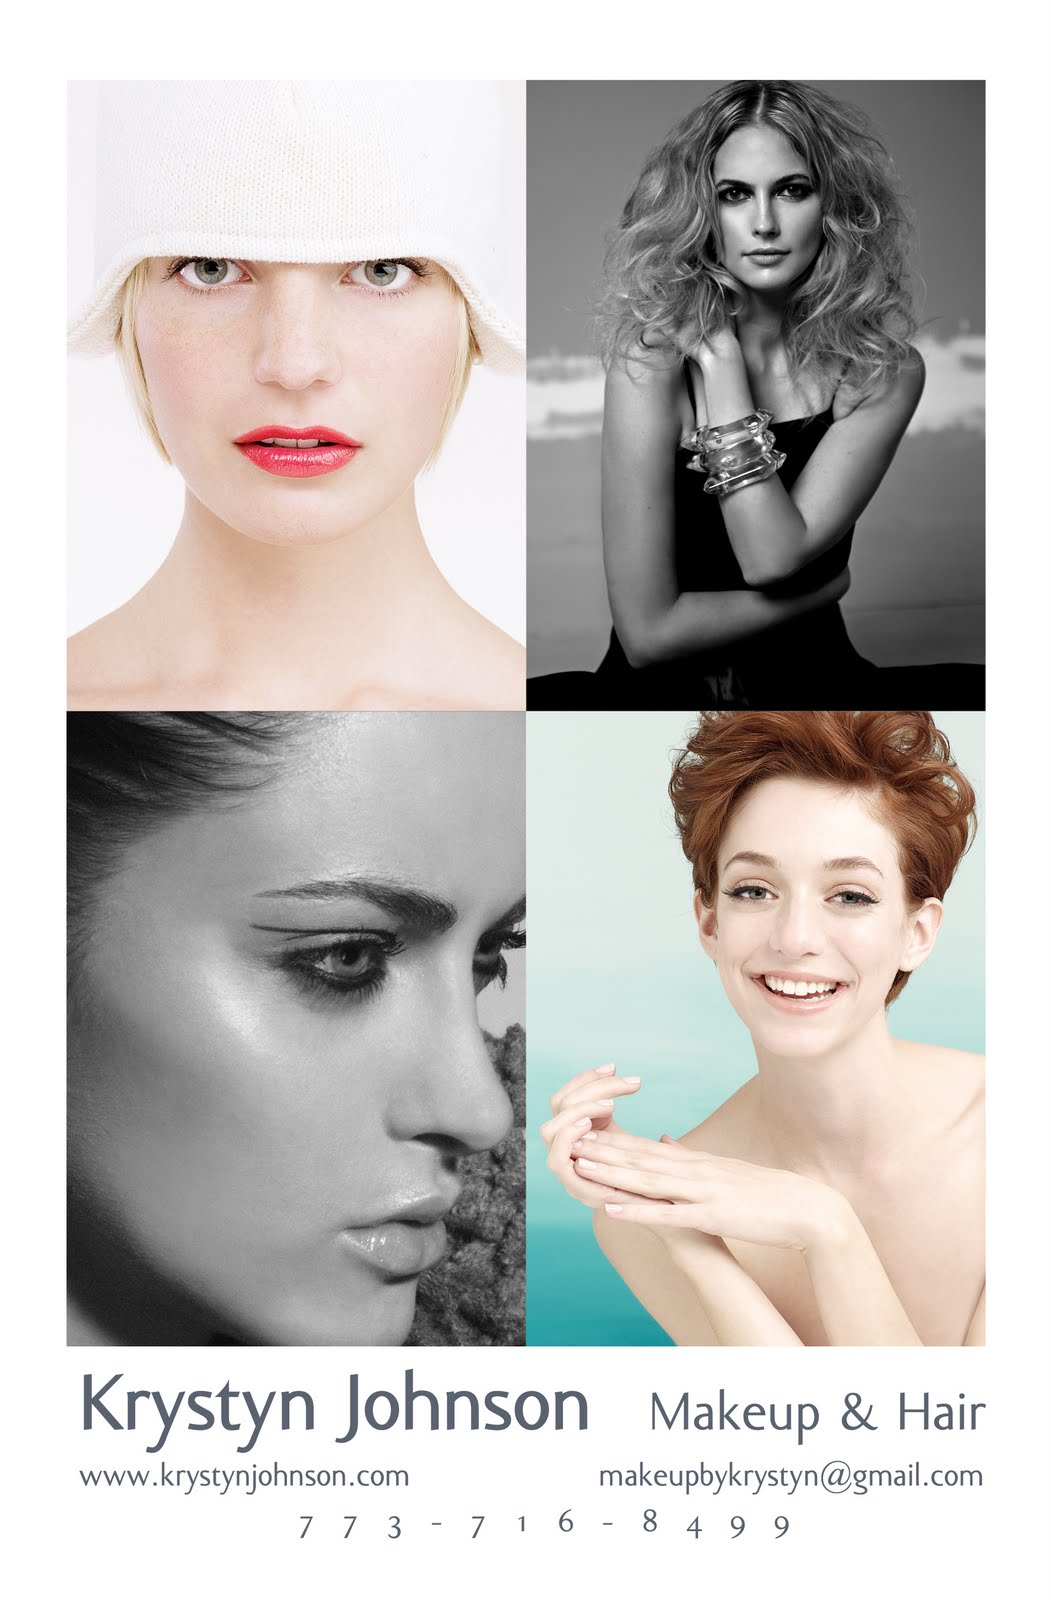 how to get makeup pro card